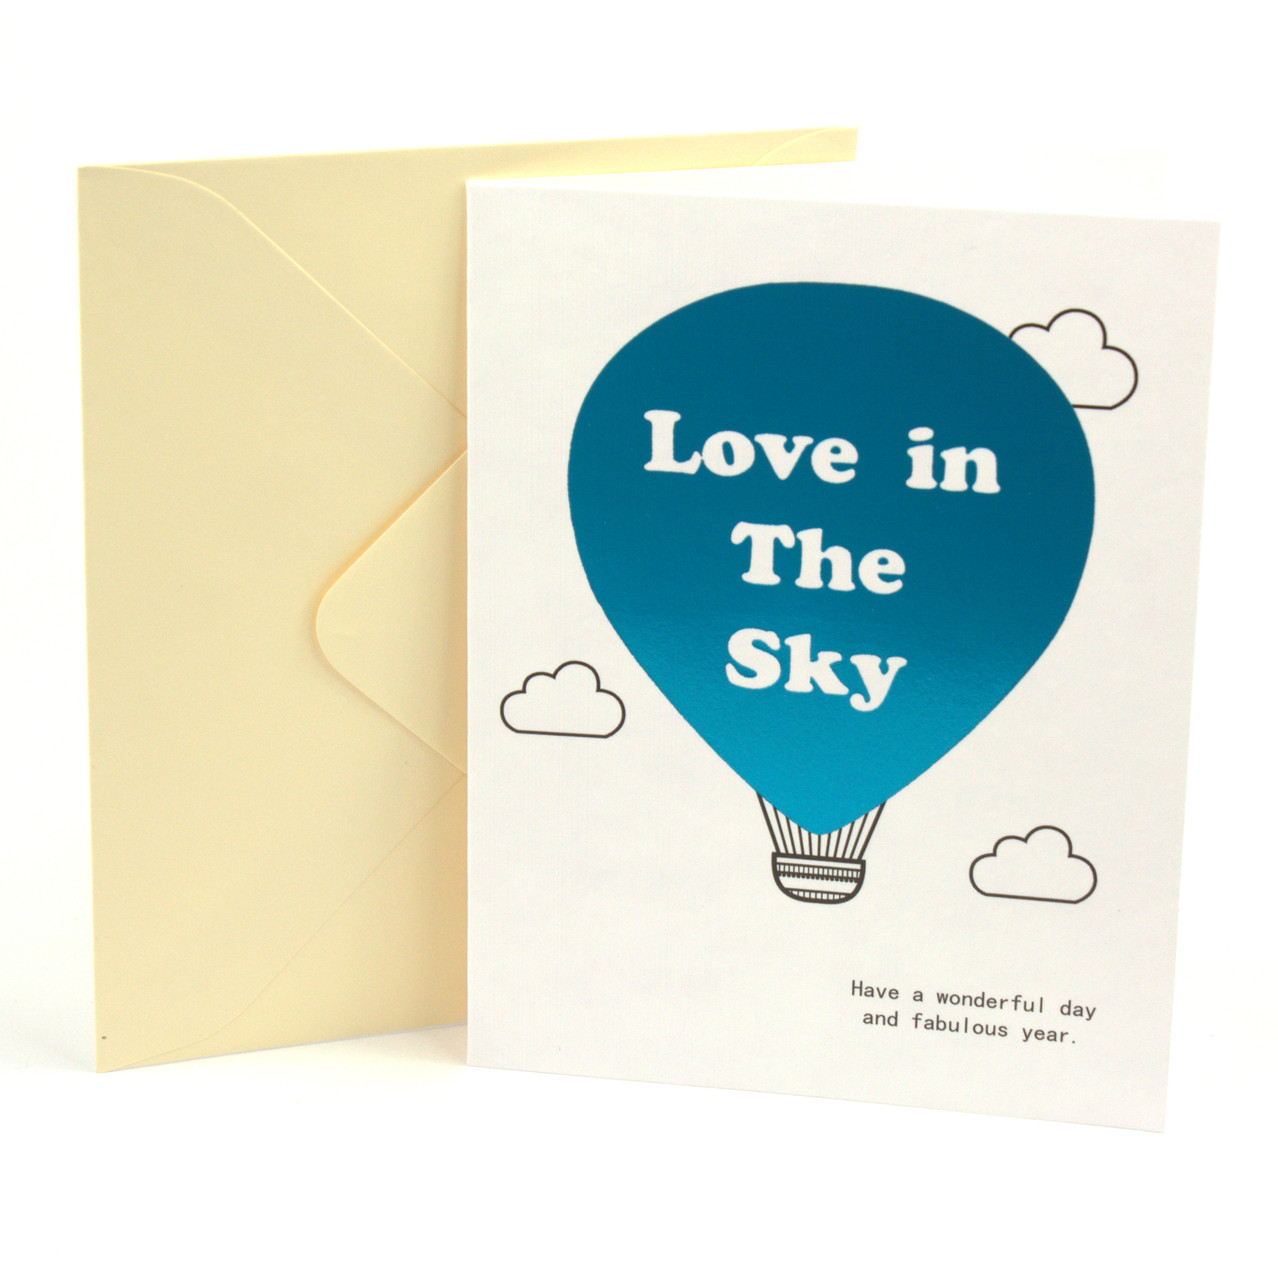 Открытка Love in The Sky с тиснением и элементами цвета металлик